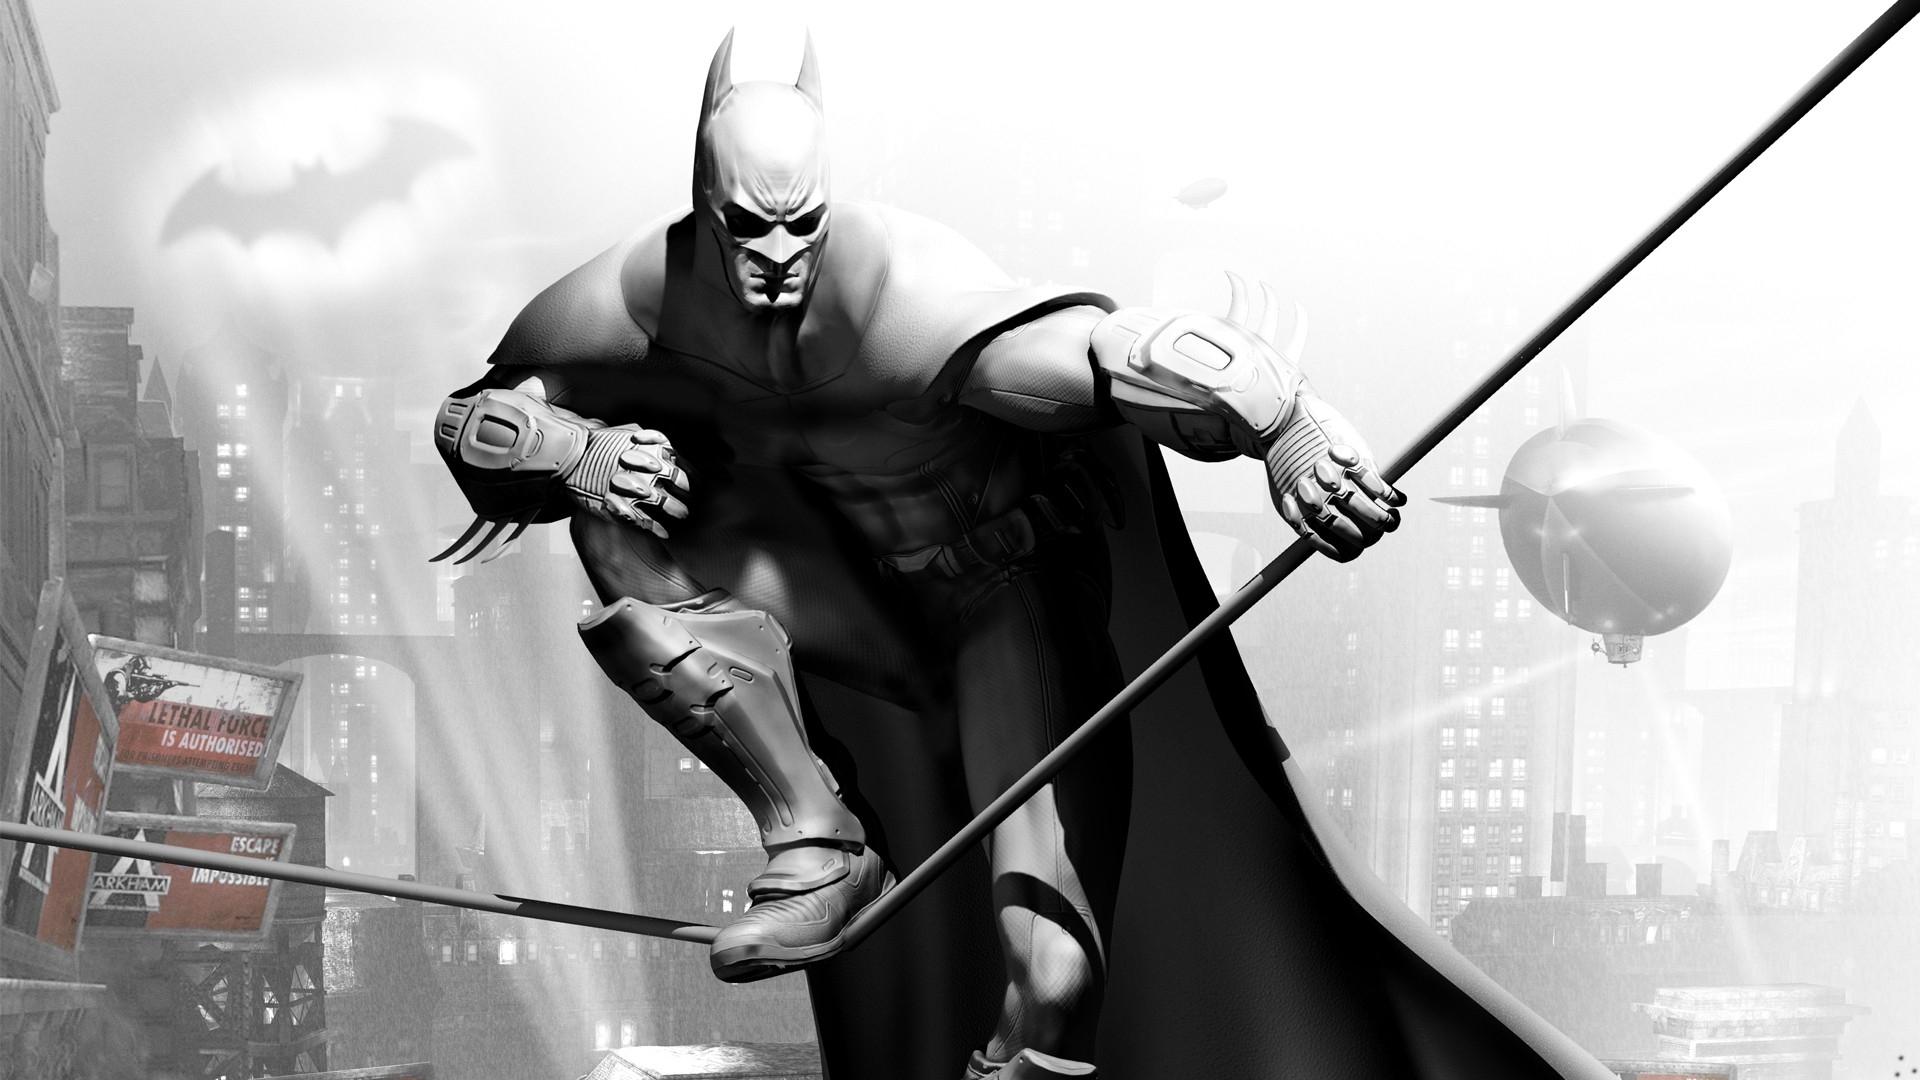 wallpaper : batman arkham city, character, cloak, airship, bat